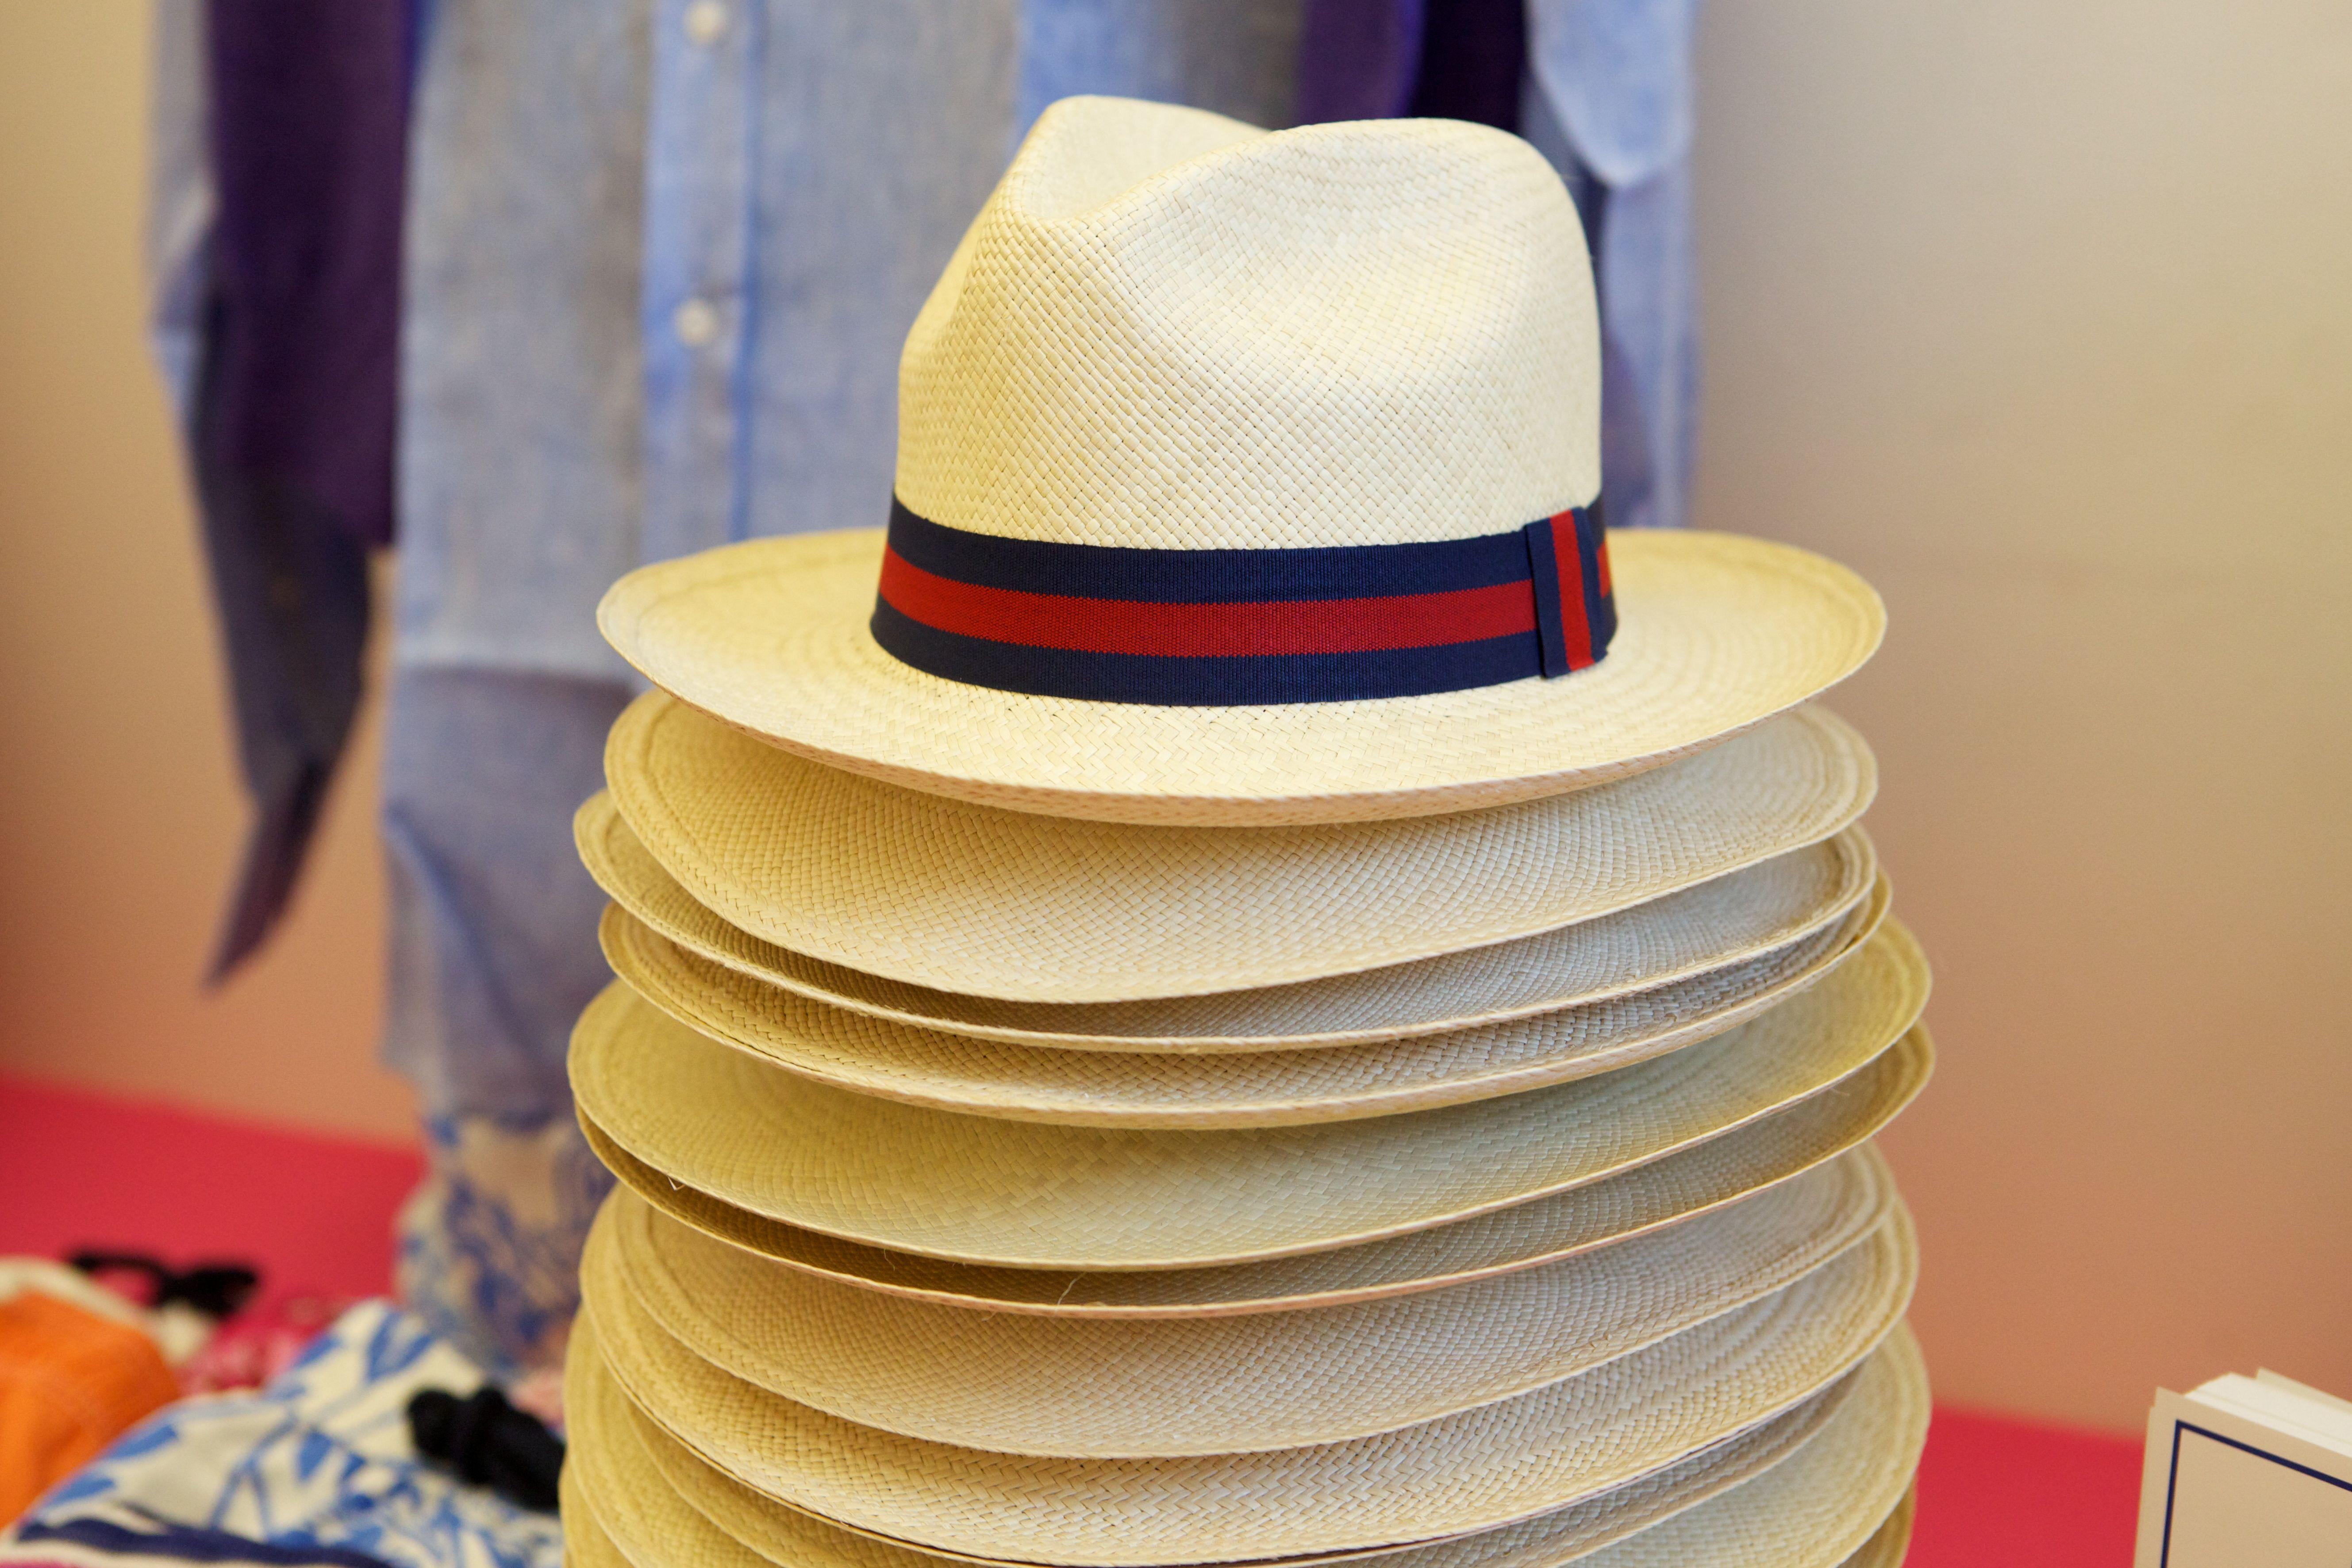 Traditional Panama Hats from Ecuador